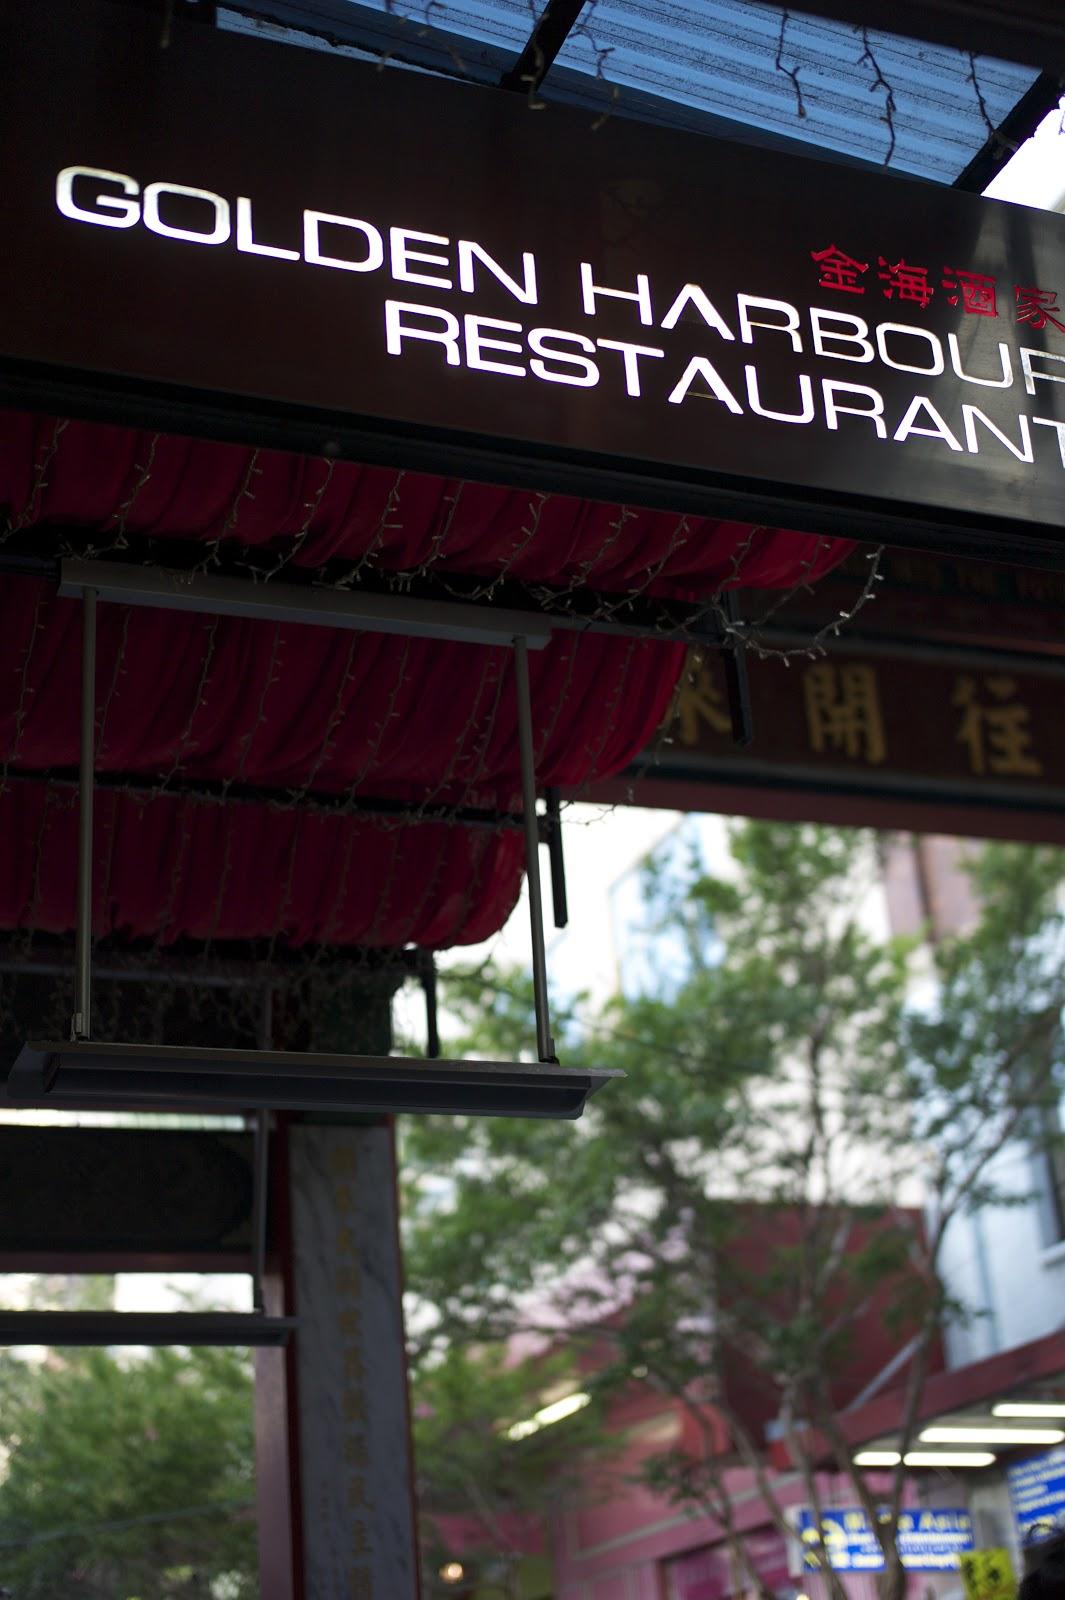 Curry Crab Golden Harbour Restaurant Dixon St Mall Chinatown Sydney